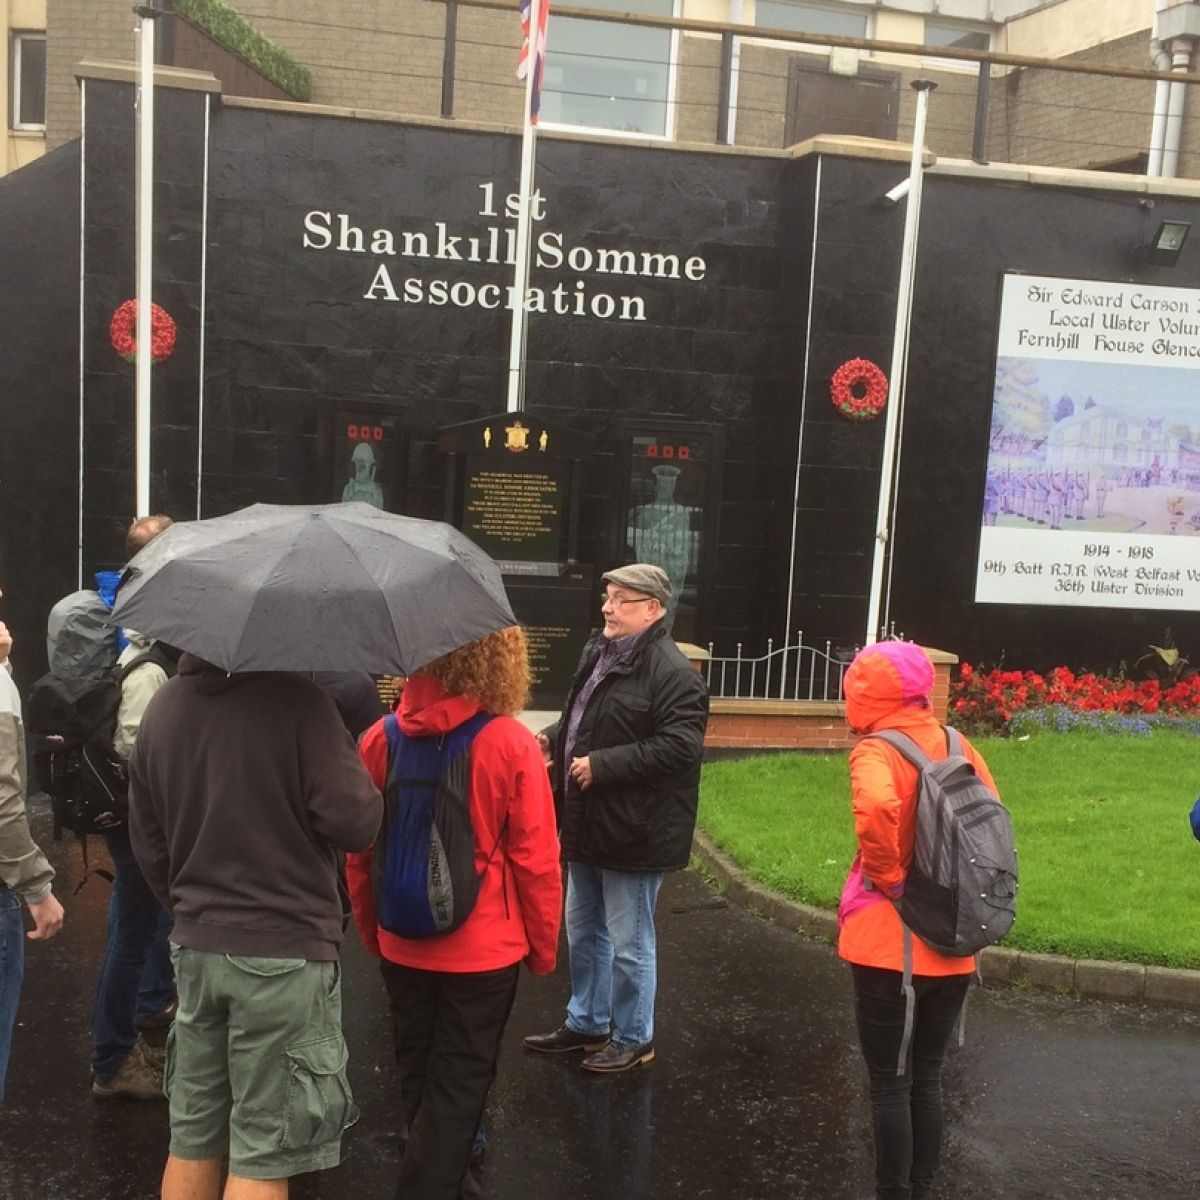 Shankill, Ireland Family Events | Eventbrite